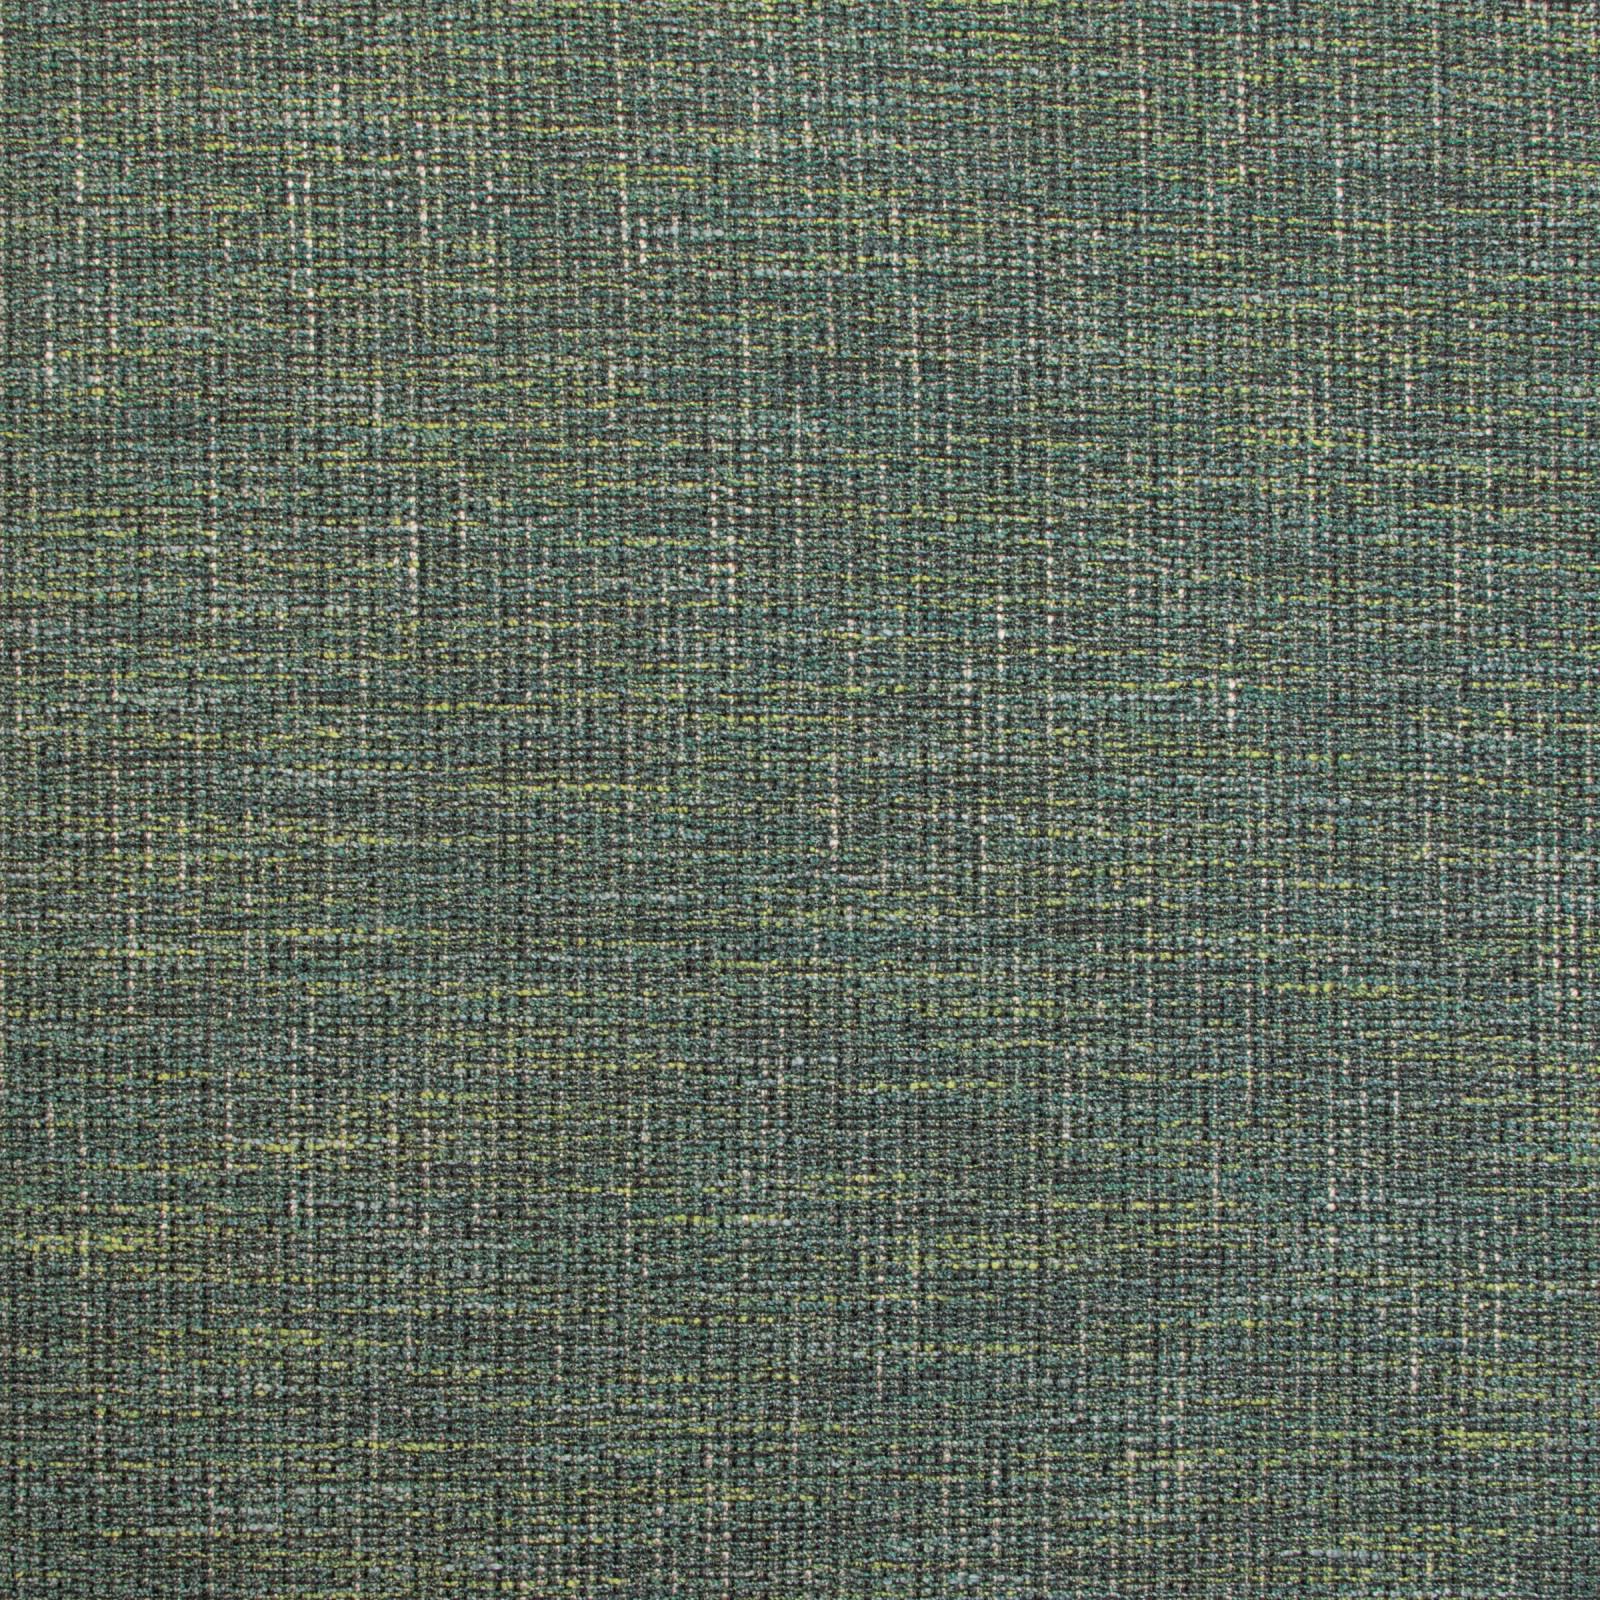 B9401 Jade Greenhouse Fabrics